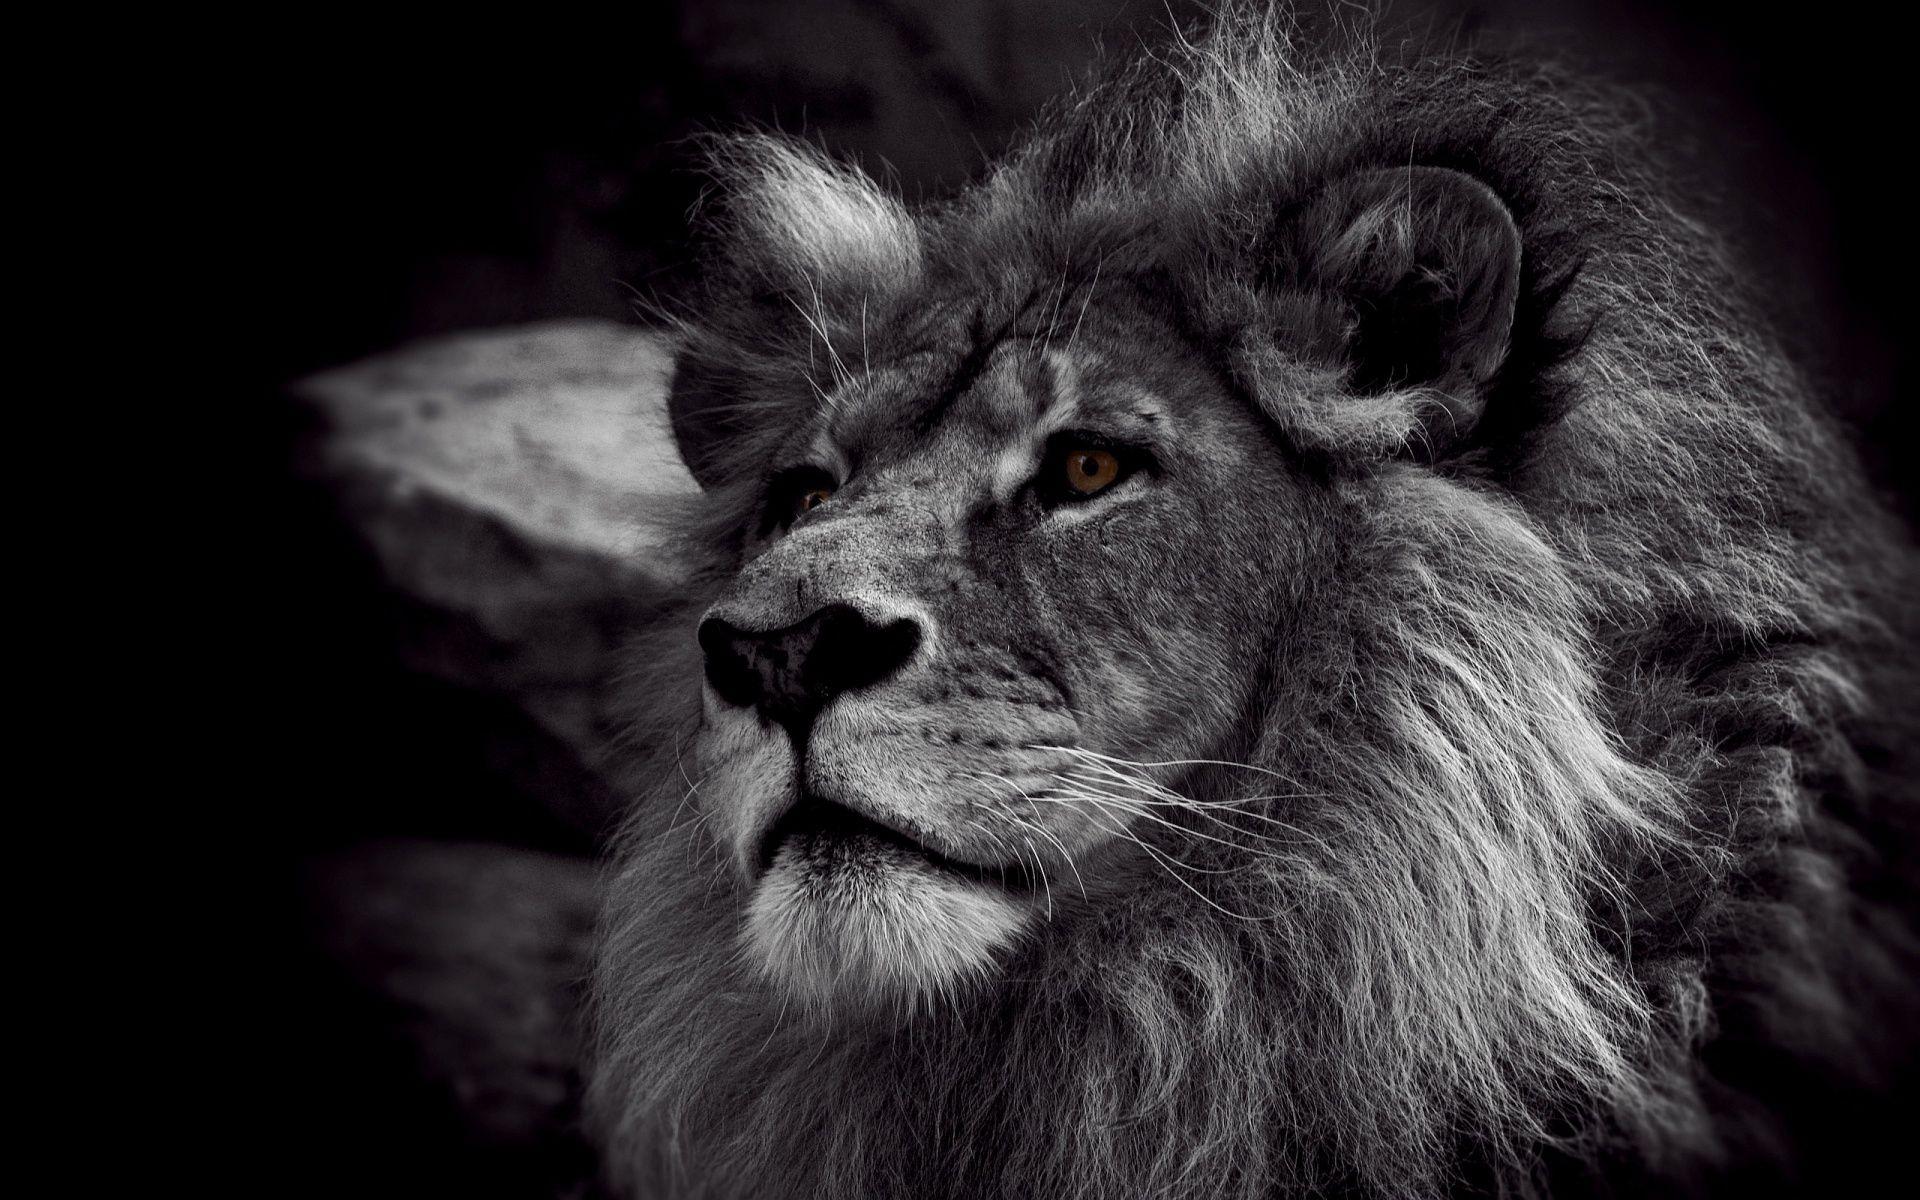 Lion Black And White Animal best Wallpaper